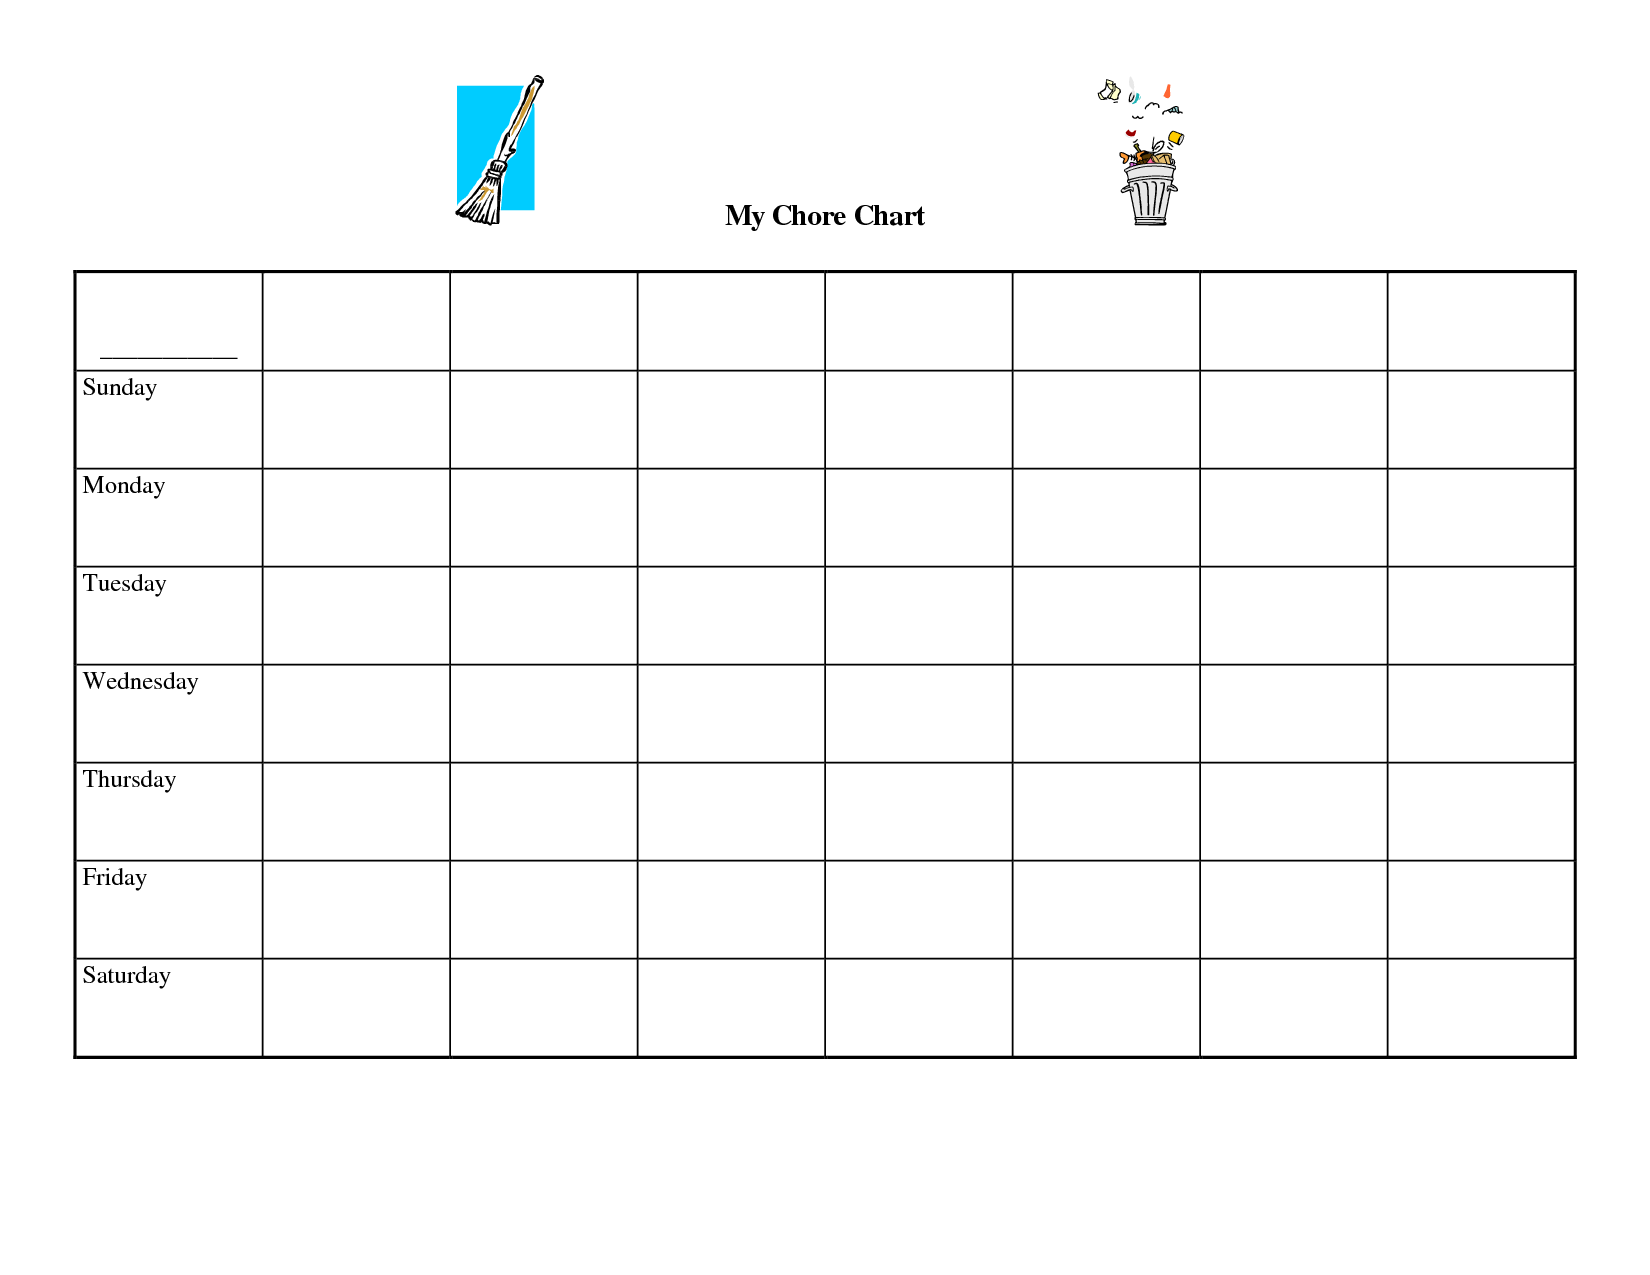 ... Printable Blank Chore Chart Templates & Free Printable Blank Charts